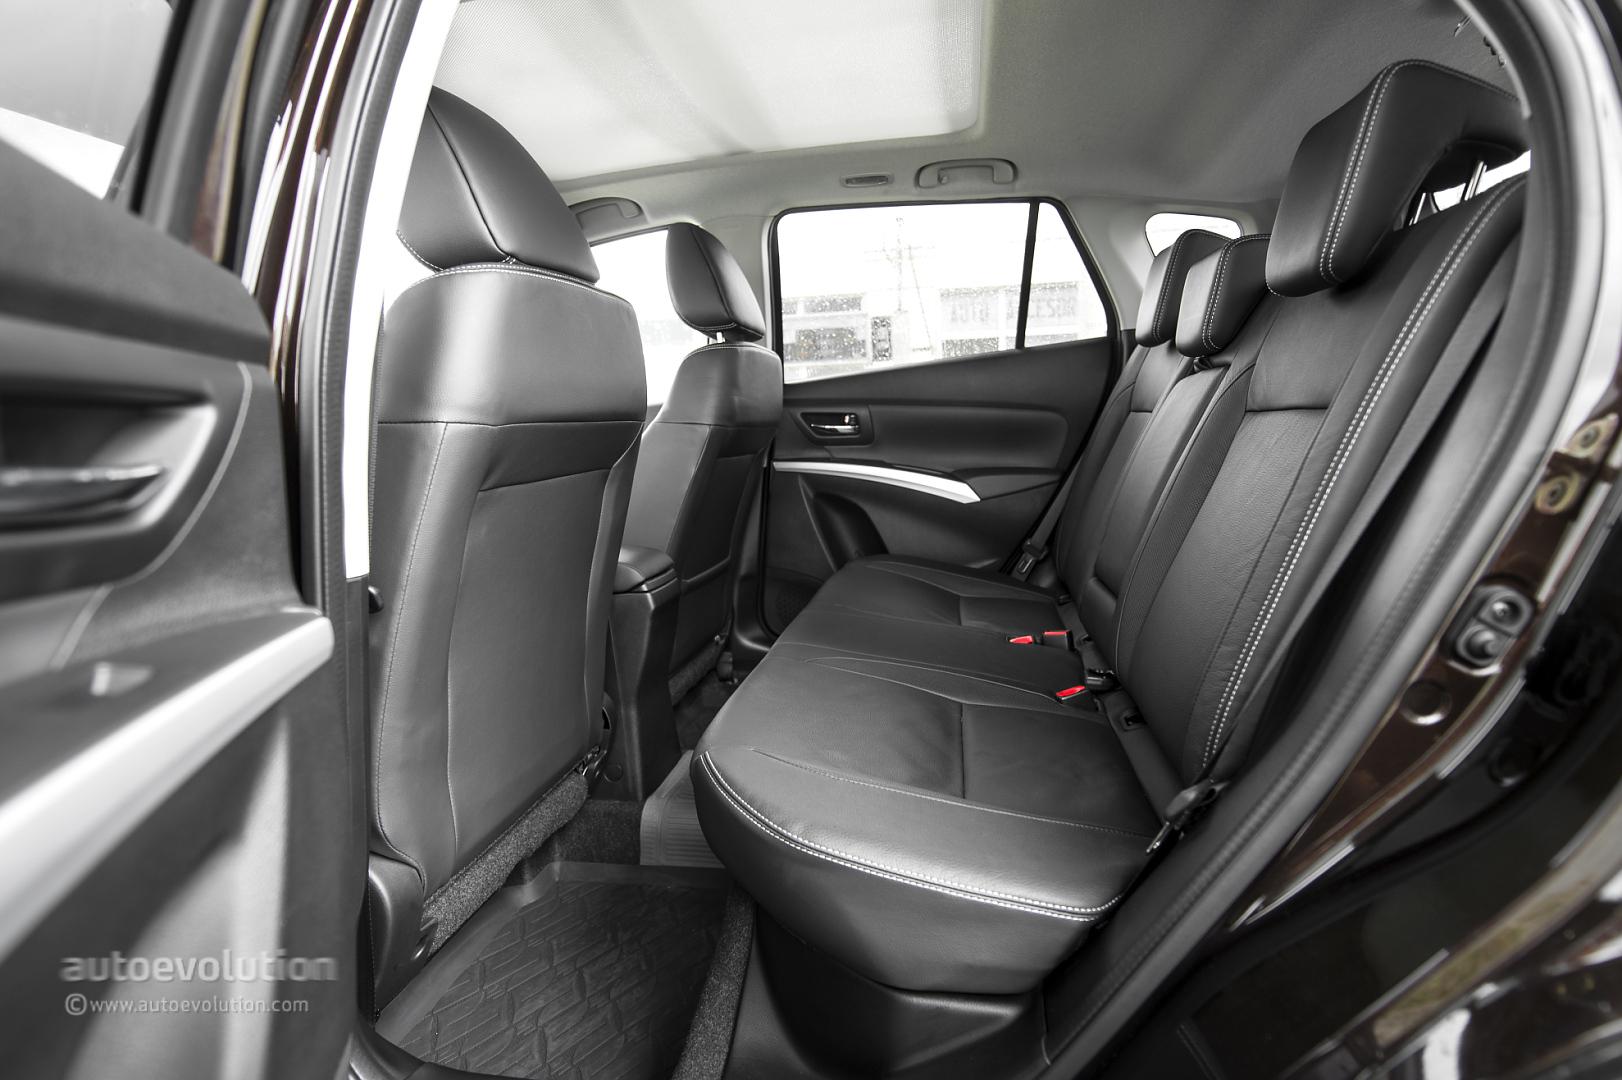 2014 Suzuki Sx 4 S Cross First Drive Autoevolution